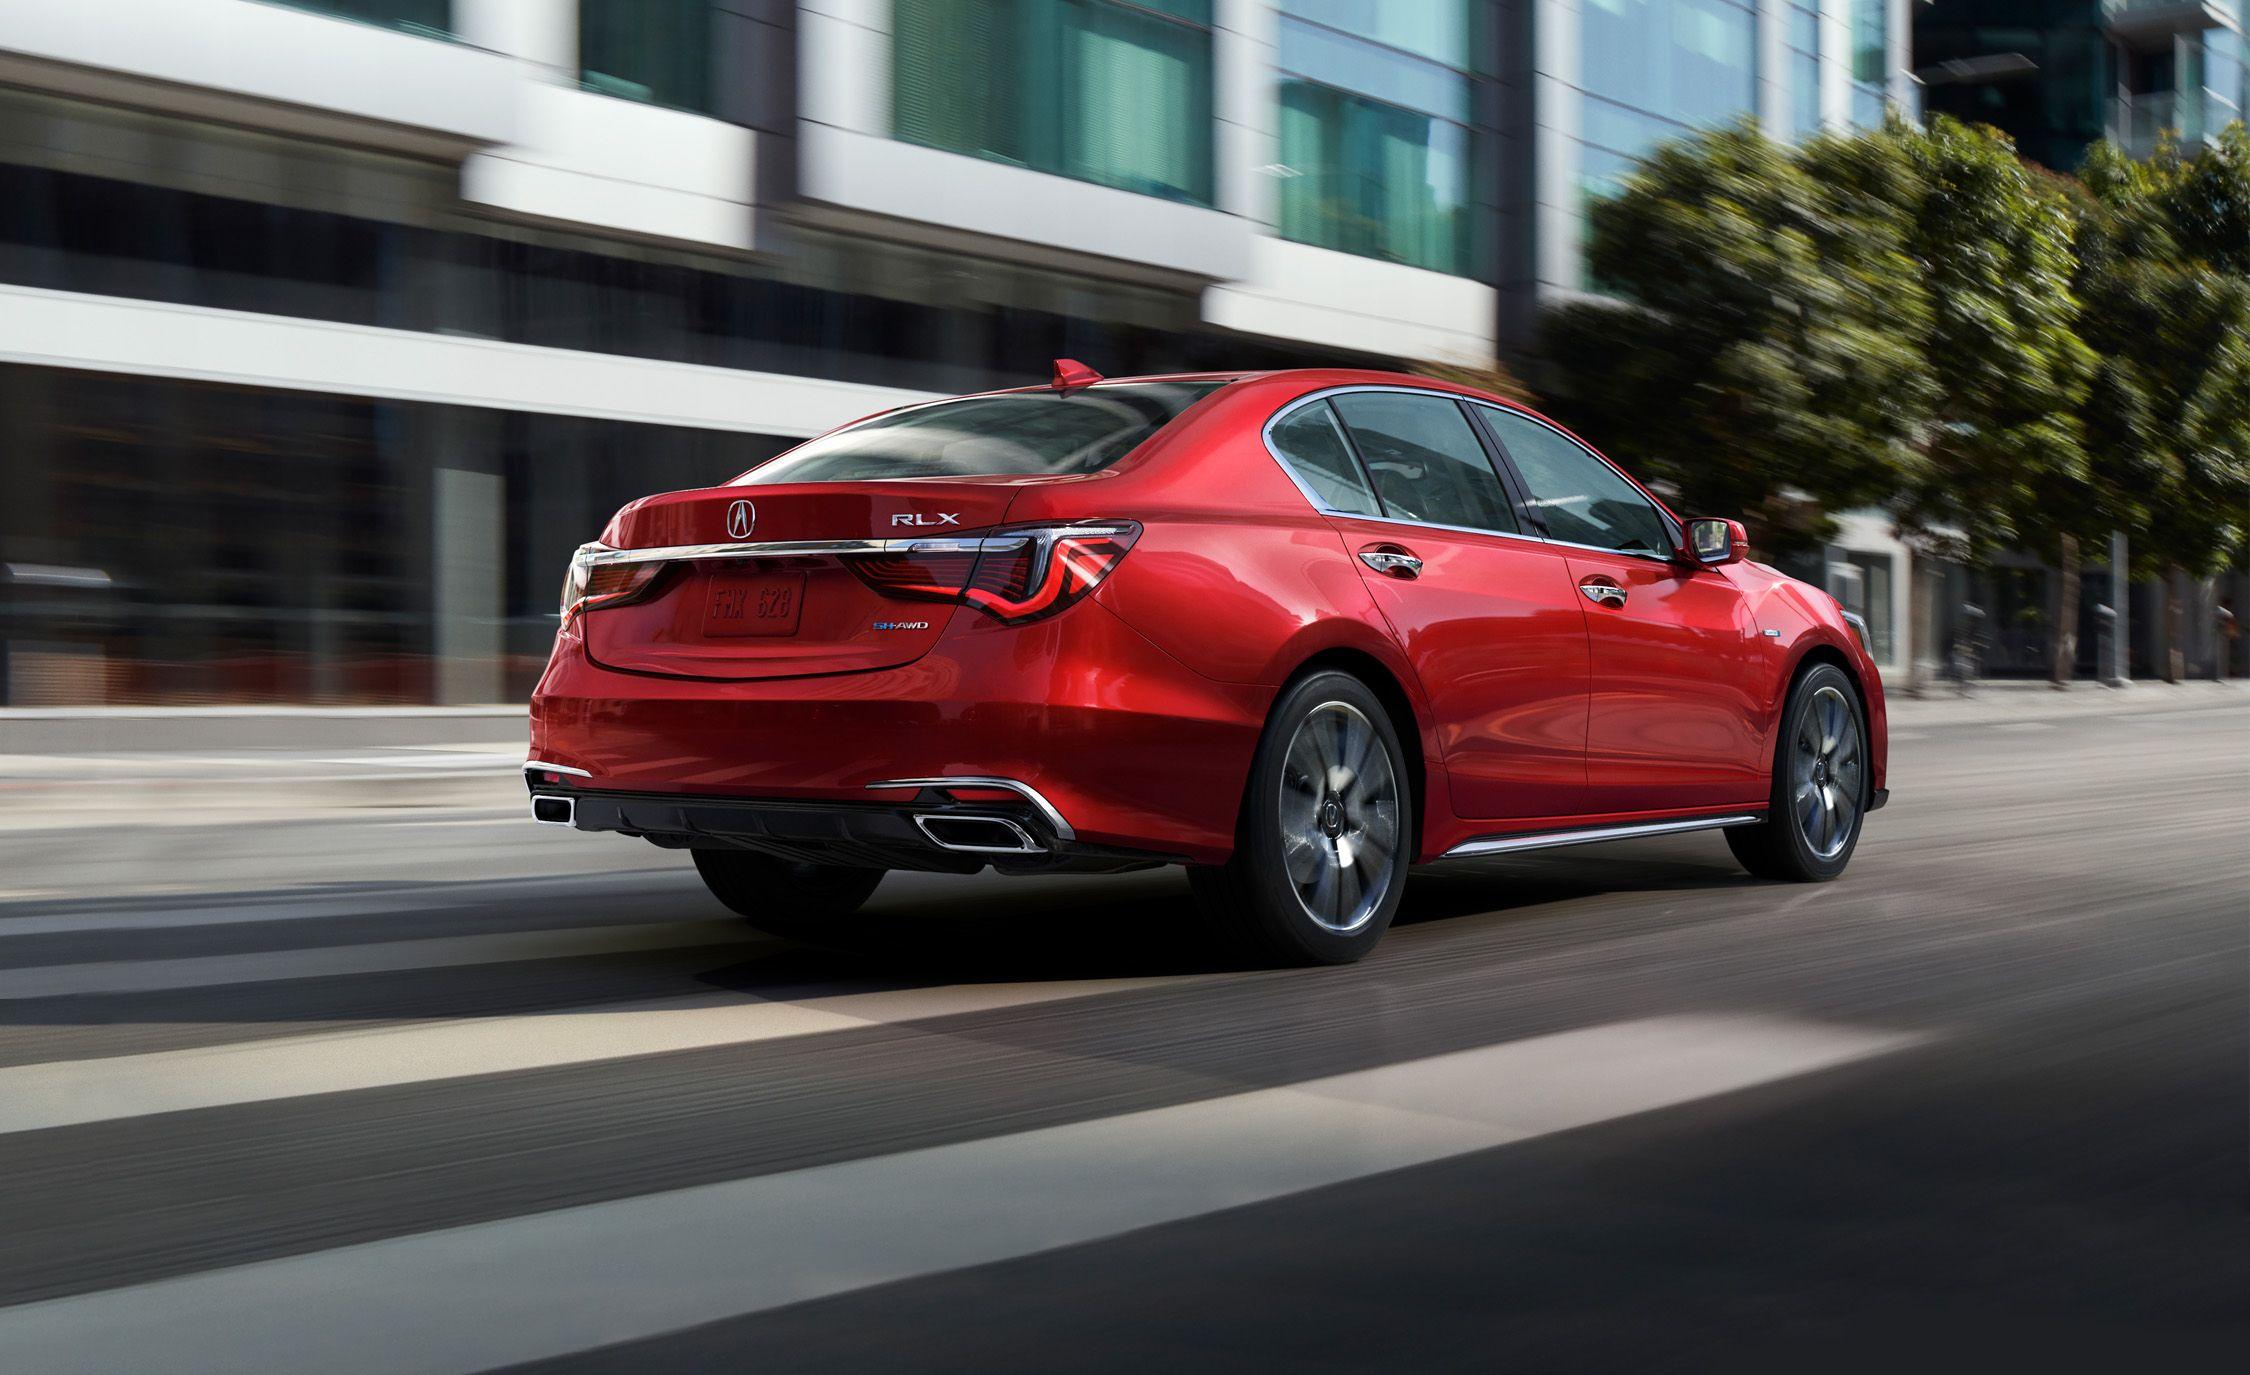 2018 Acura Rlx Ing Ahead Sans Beak